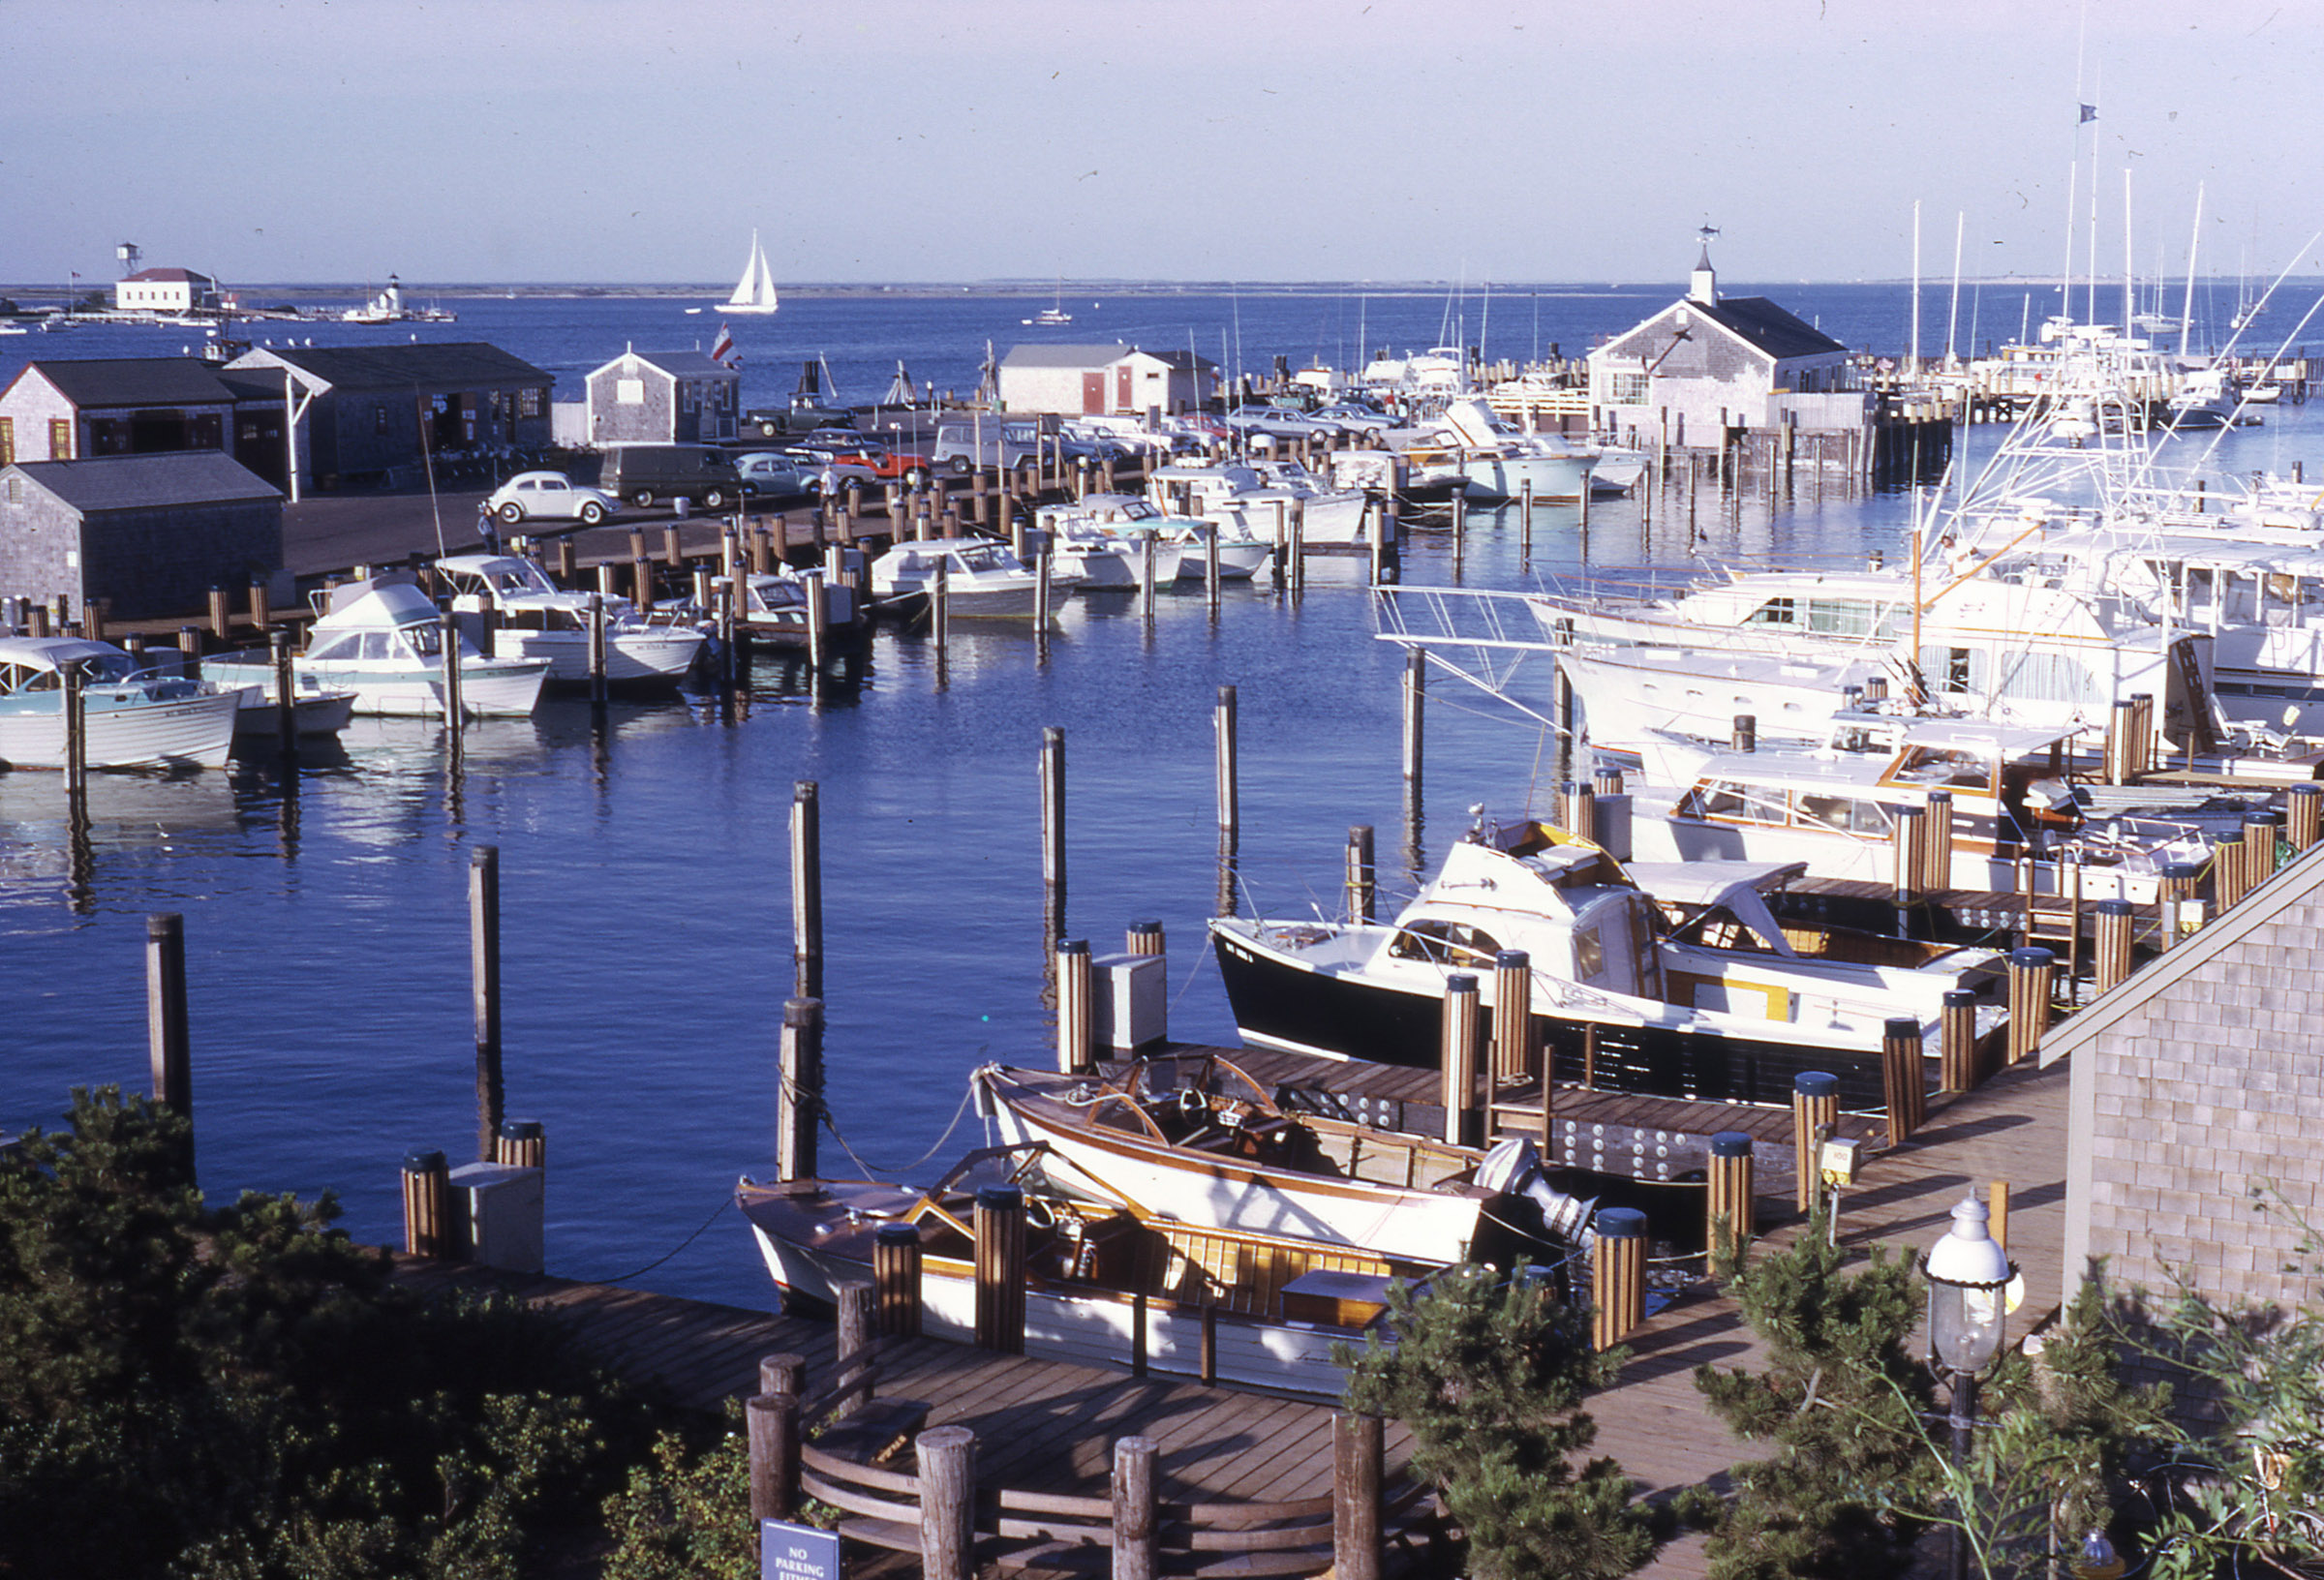 Colorized Docks